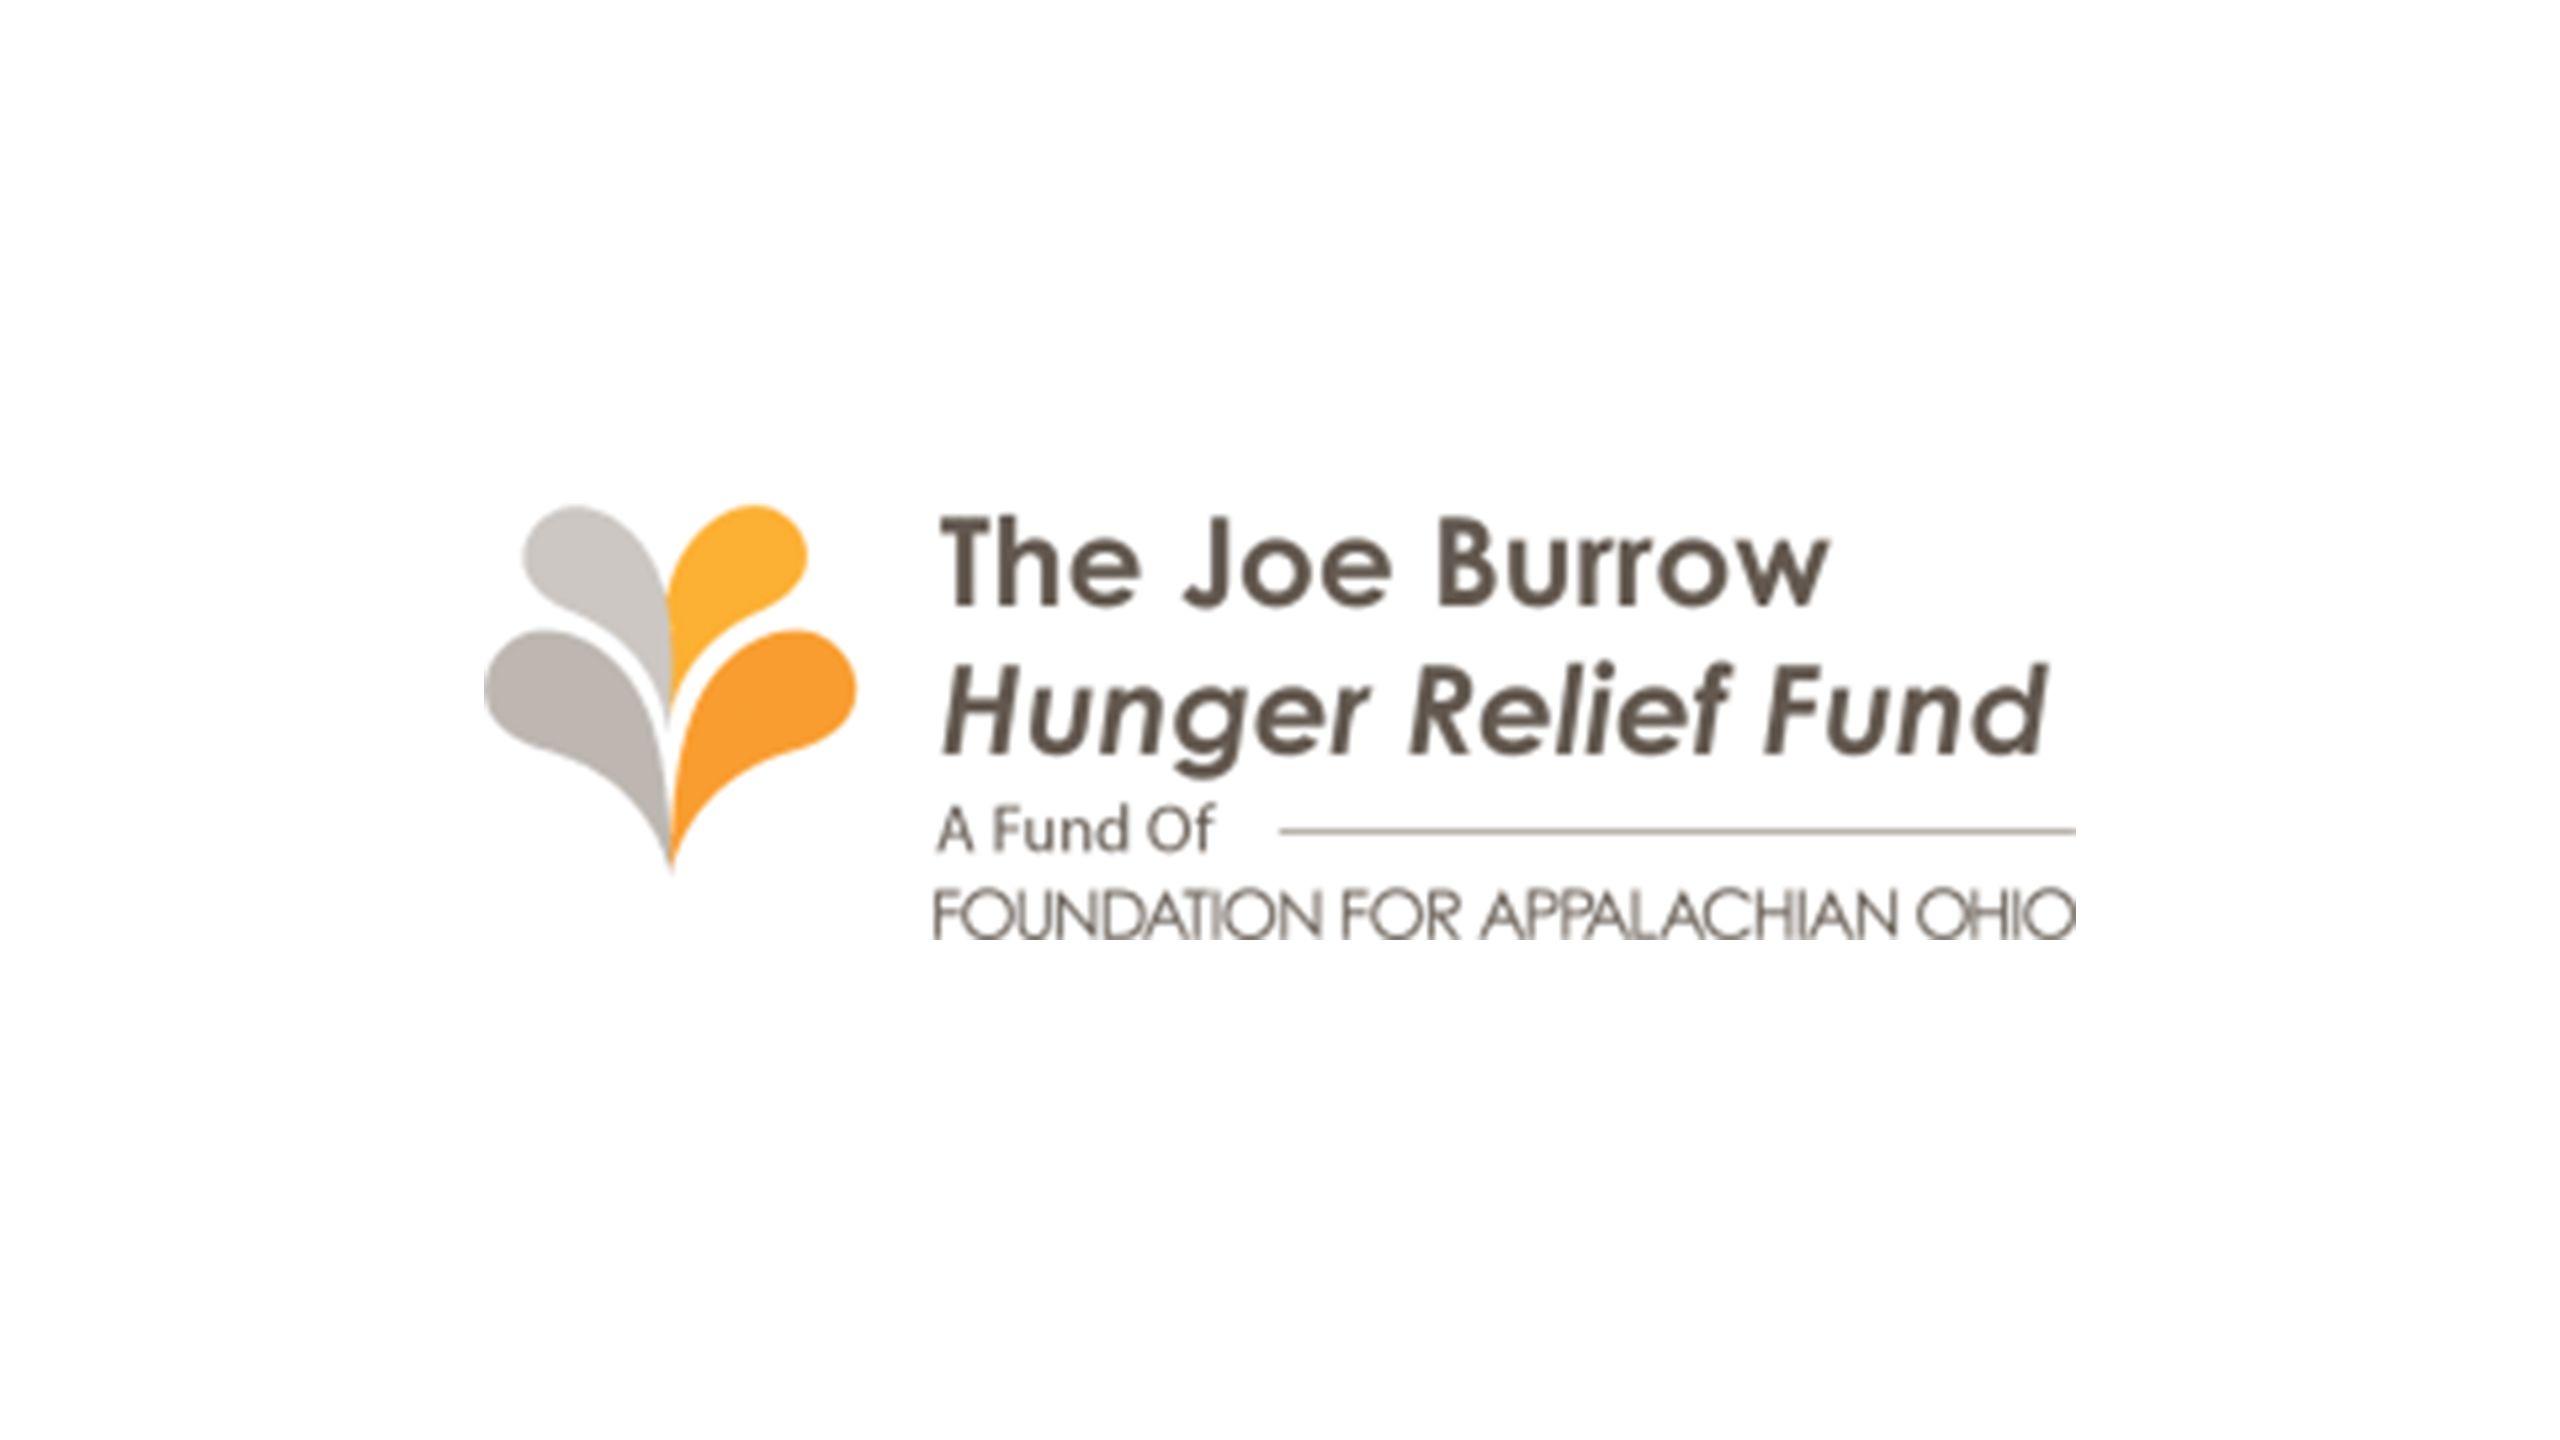 Joe Burrow Hunger Relief Fund